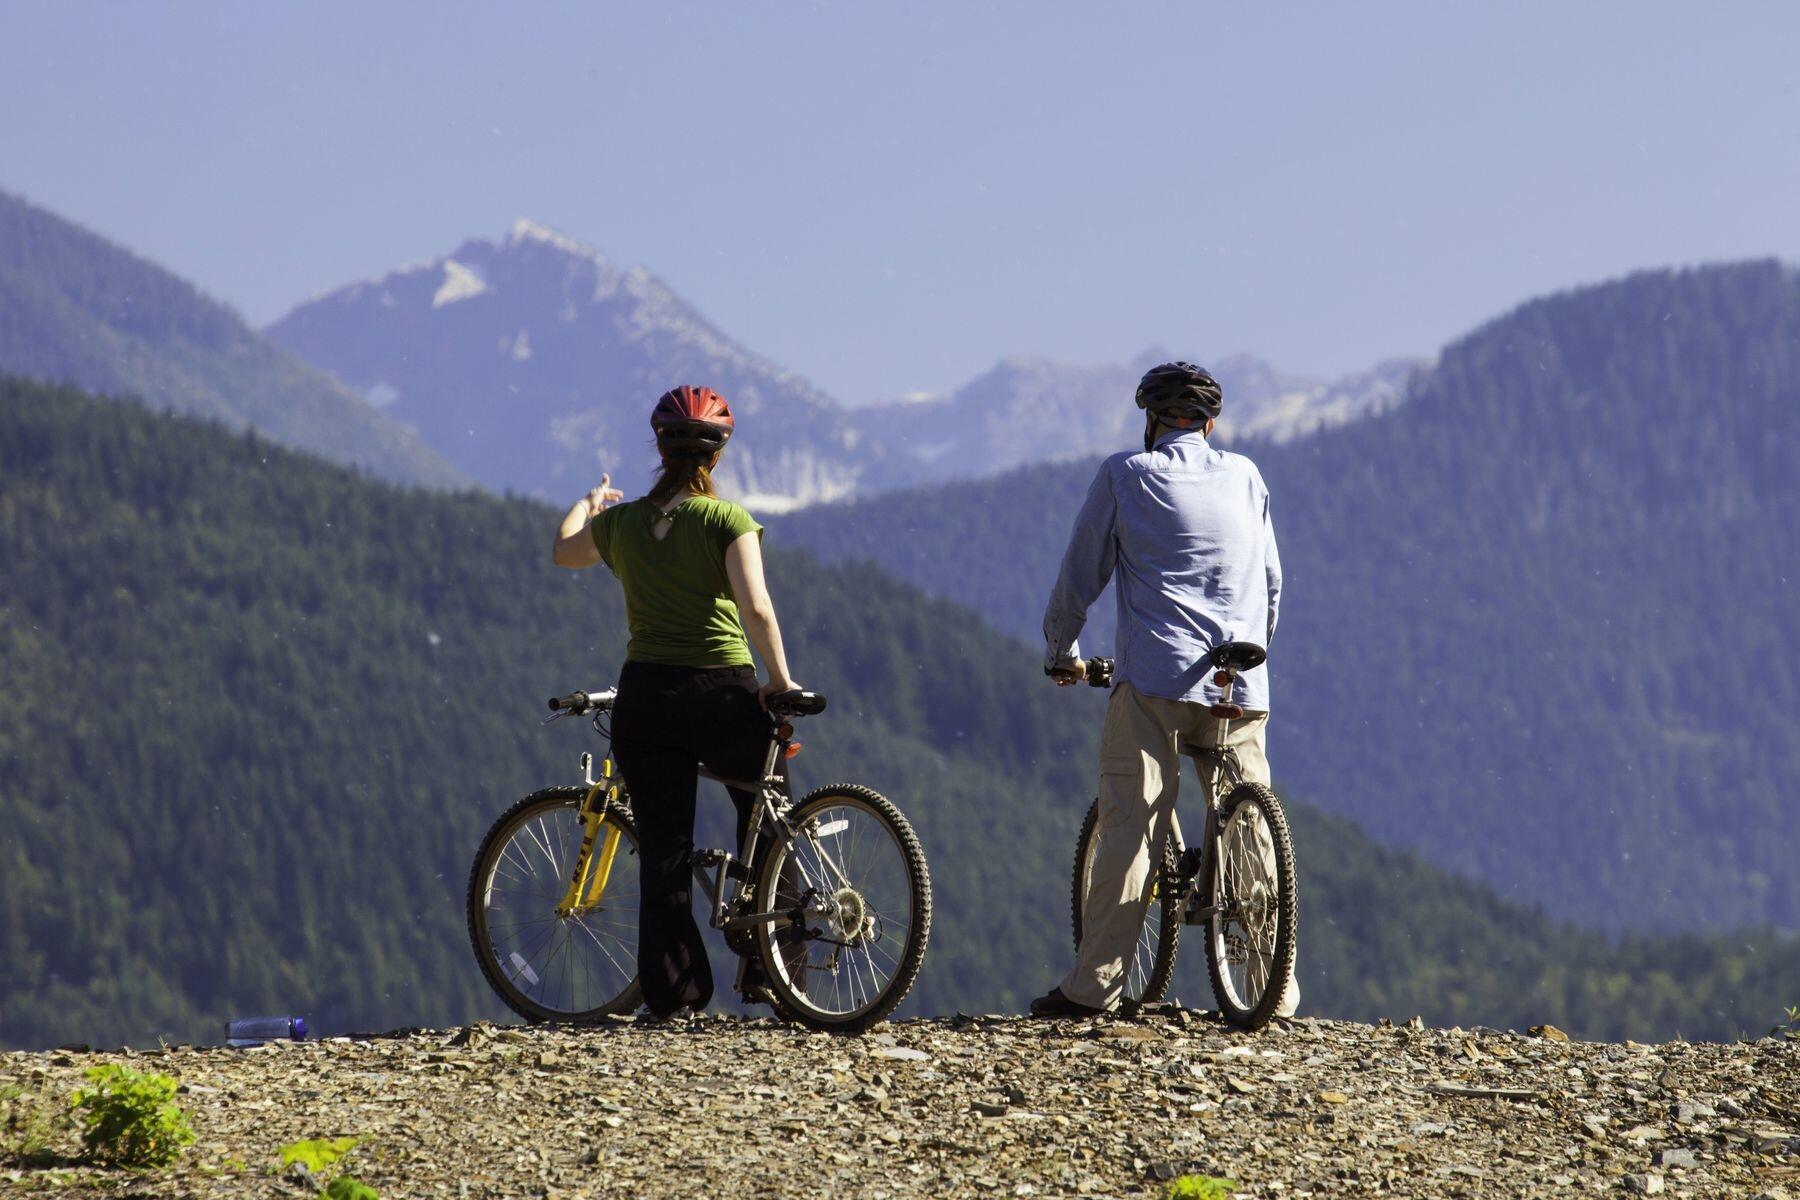 Two people on mountain bikes with mountain views